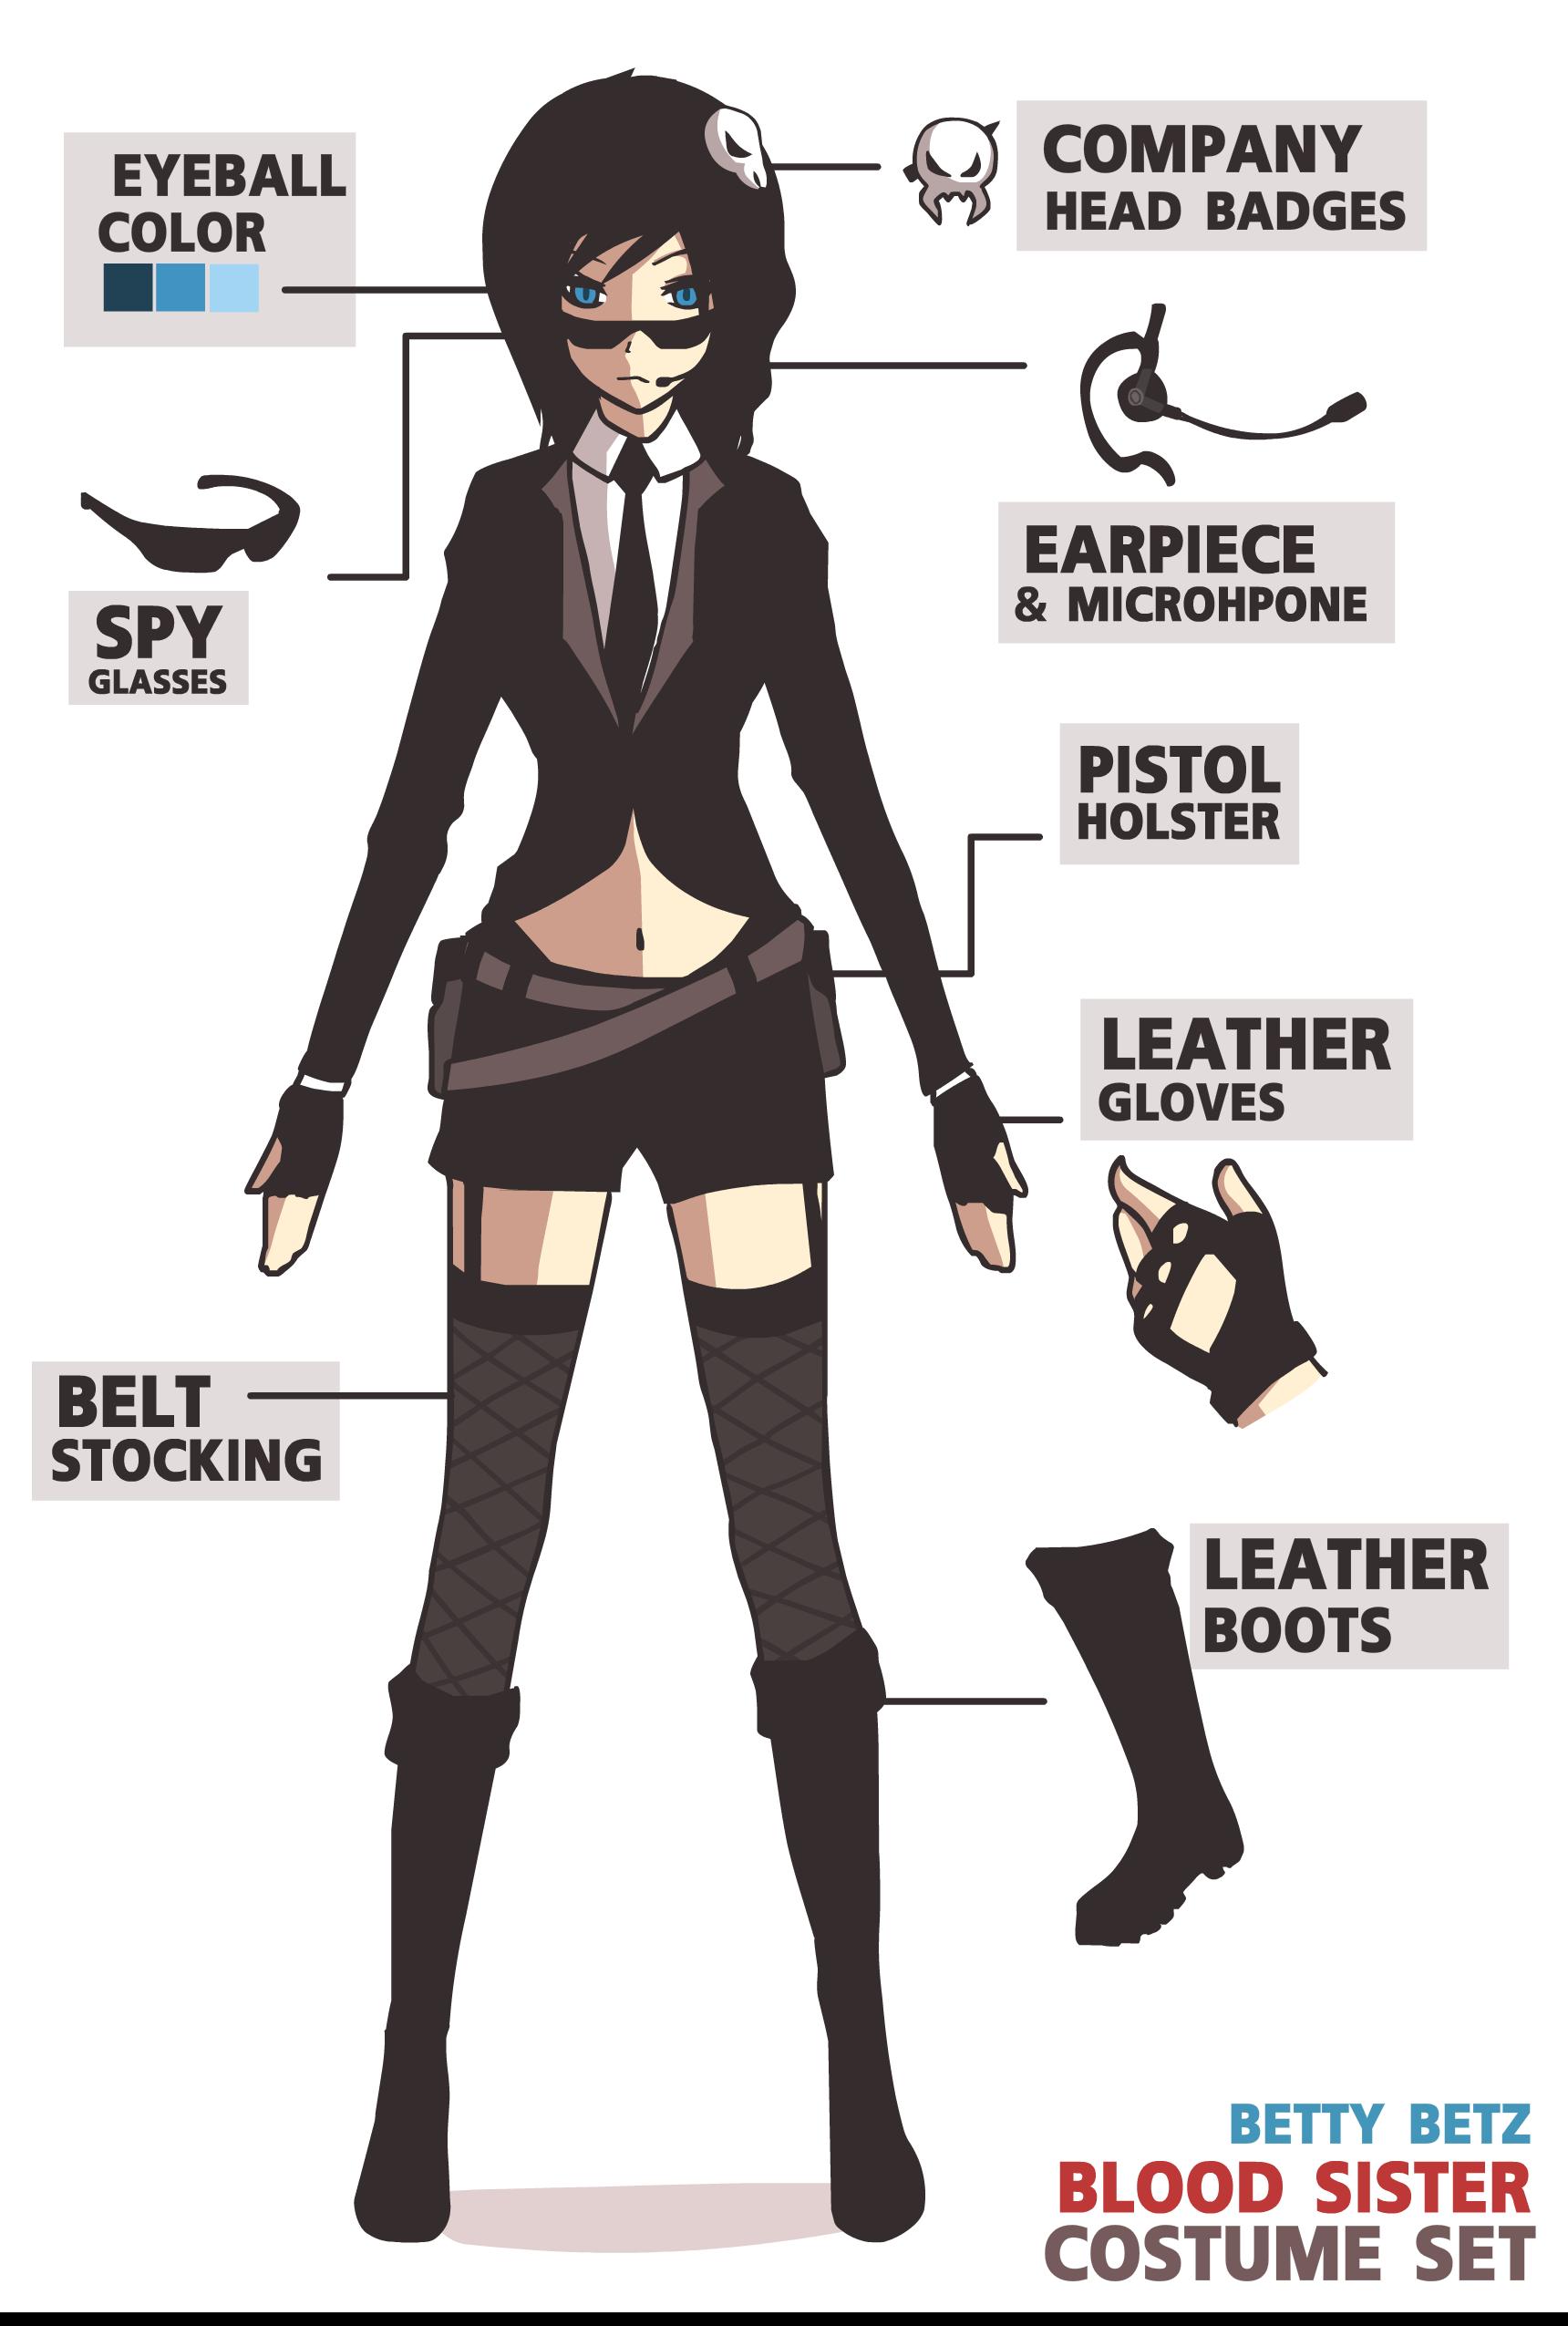 Blood sister costume